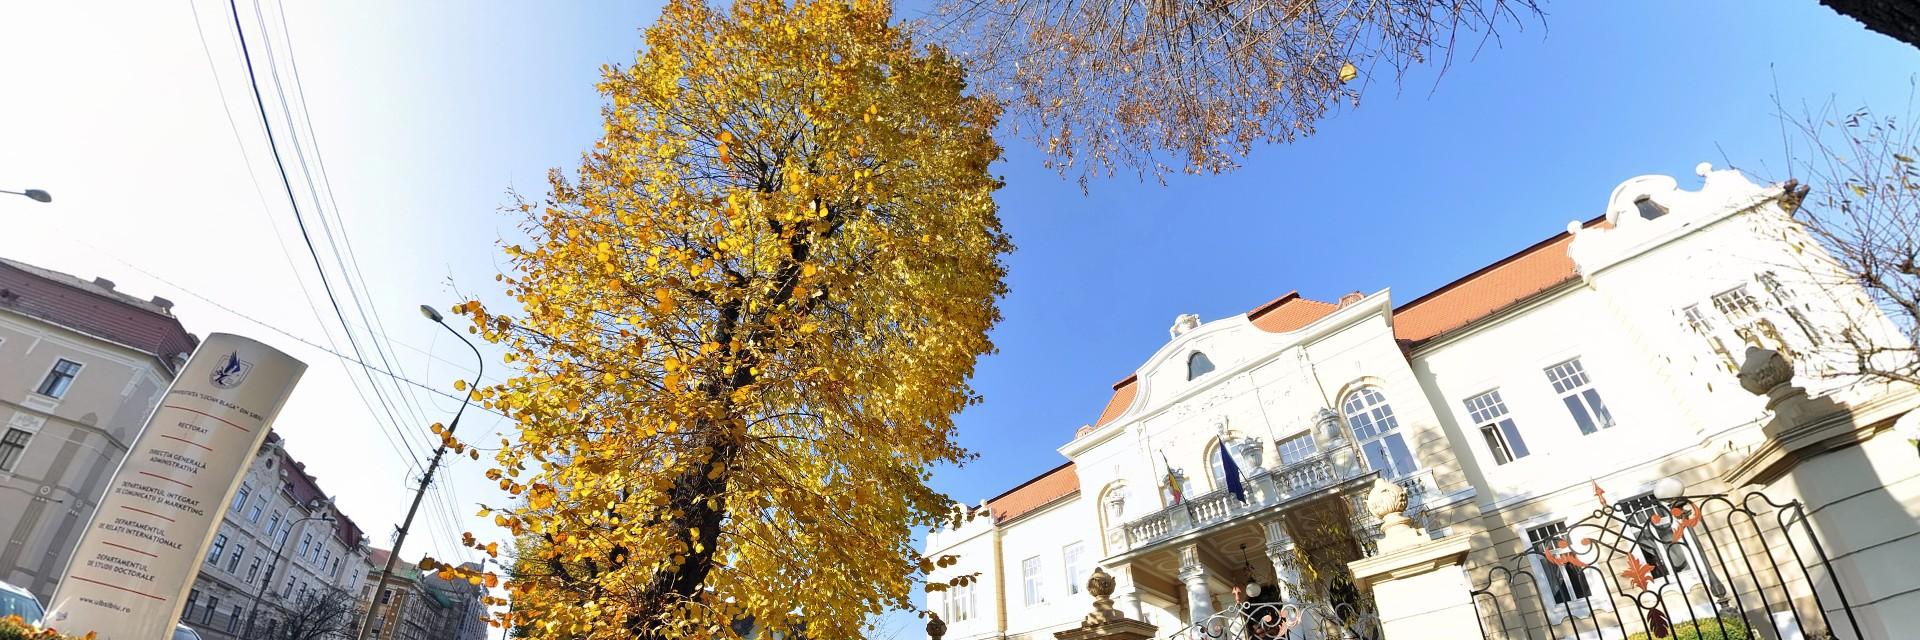 Universitatea Lucian Blaga Din Sibiu